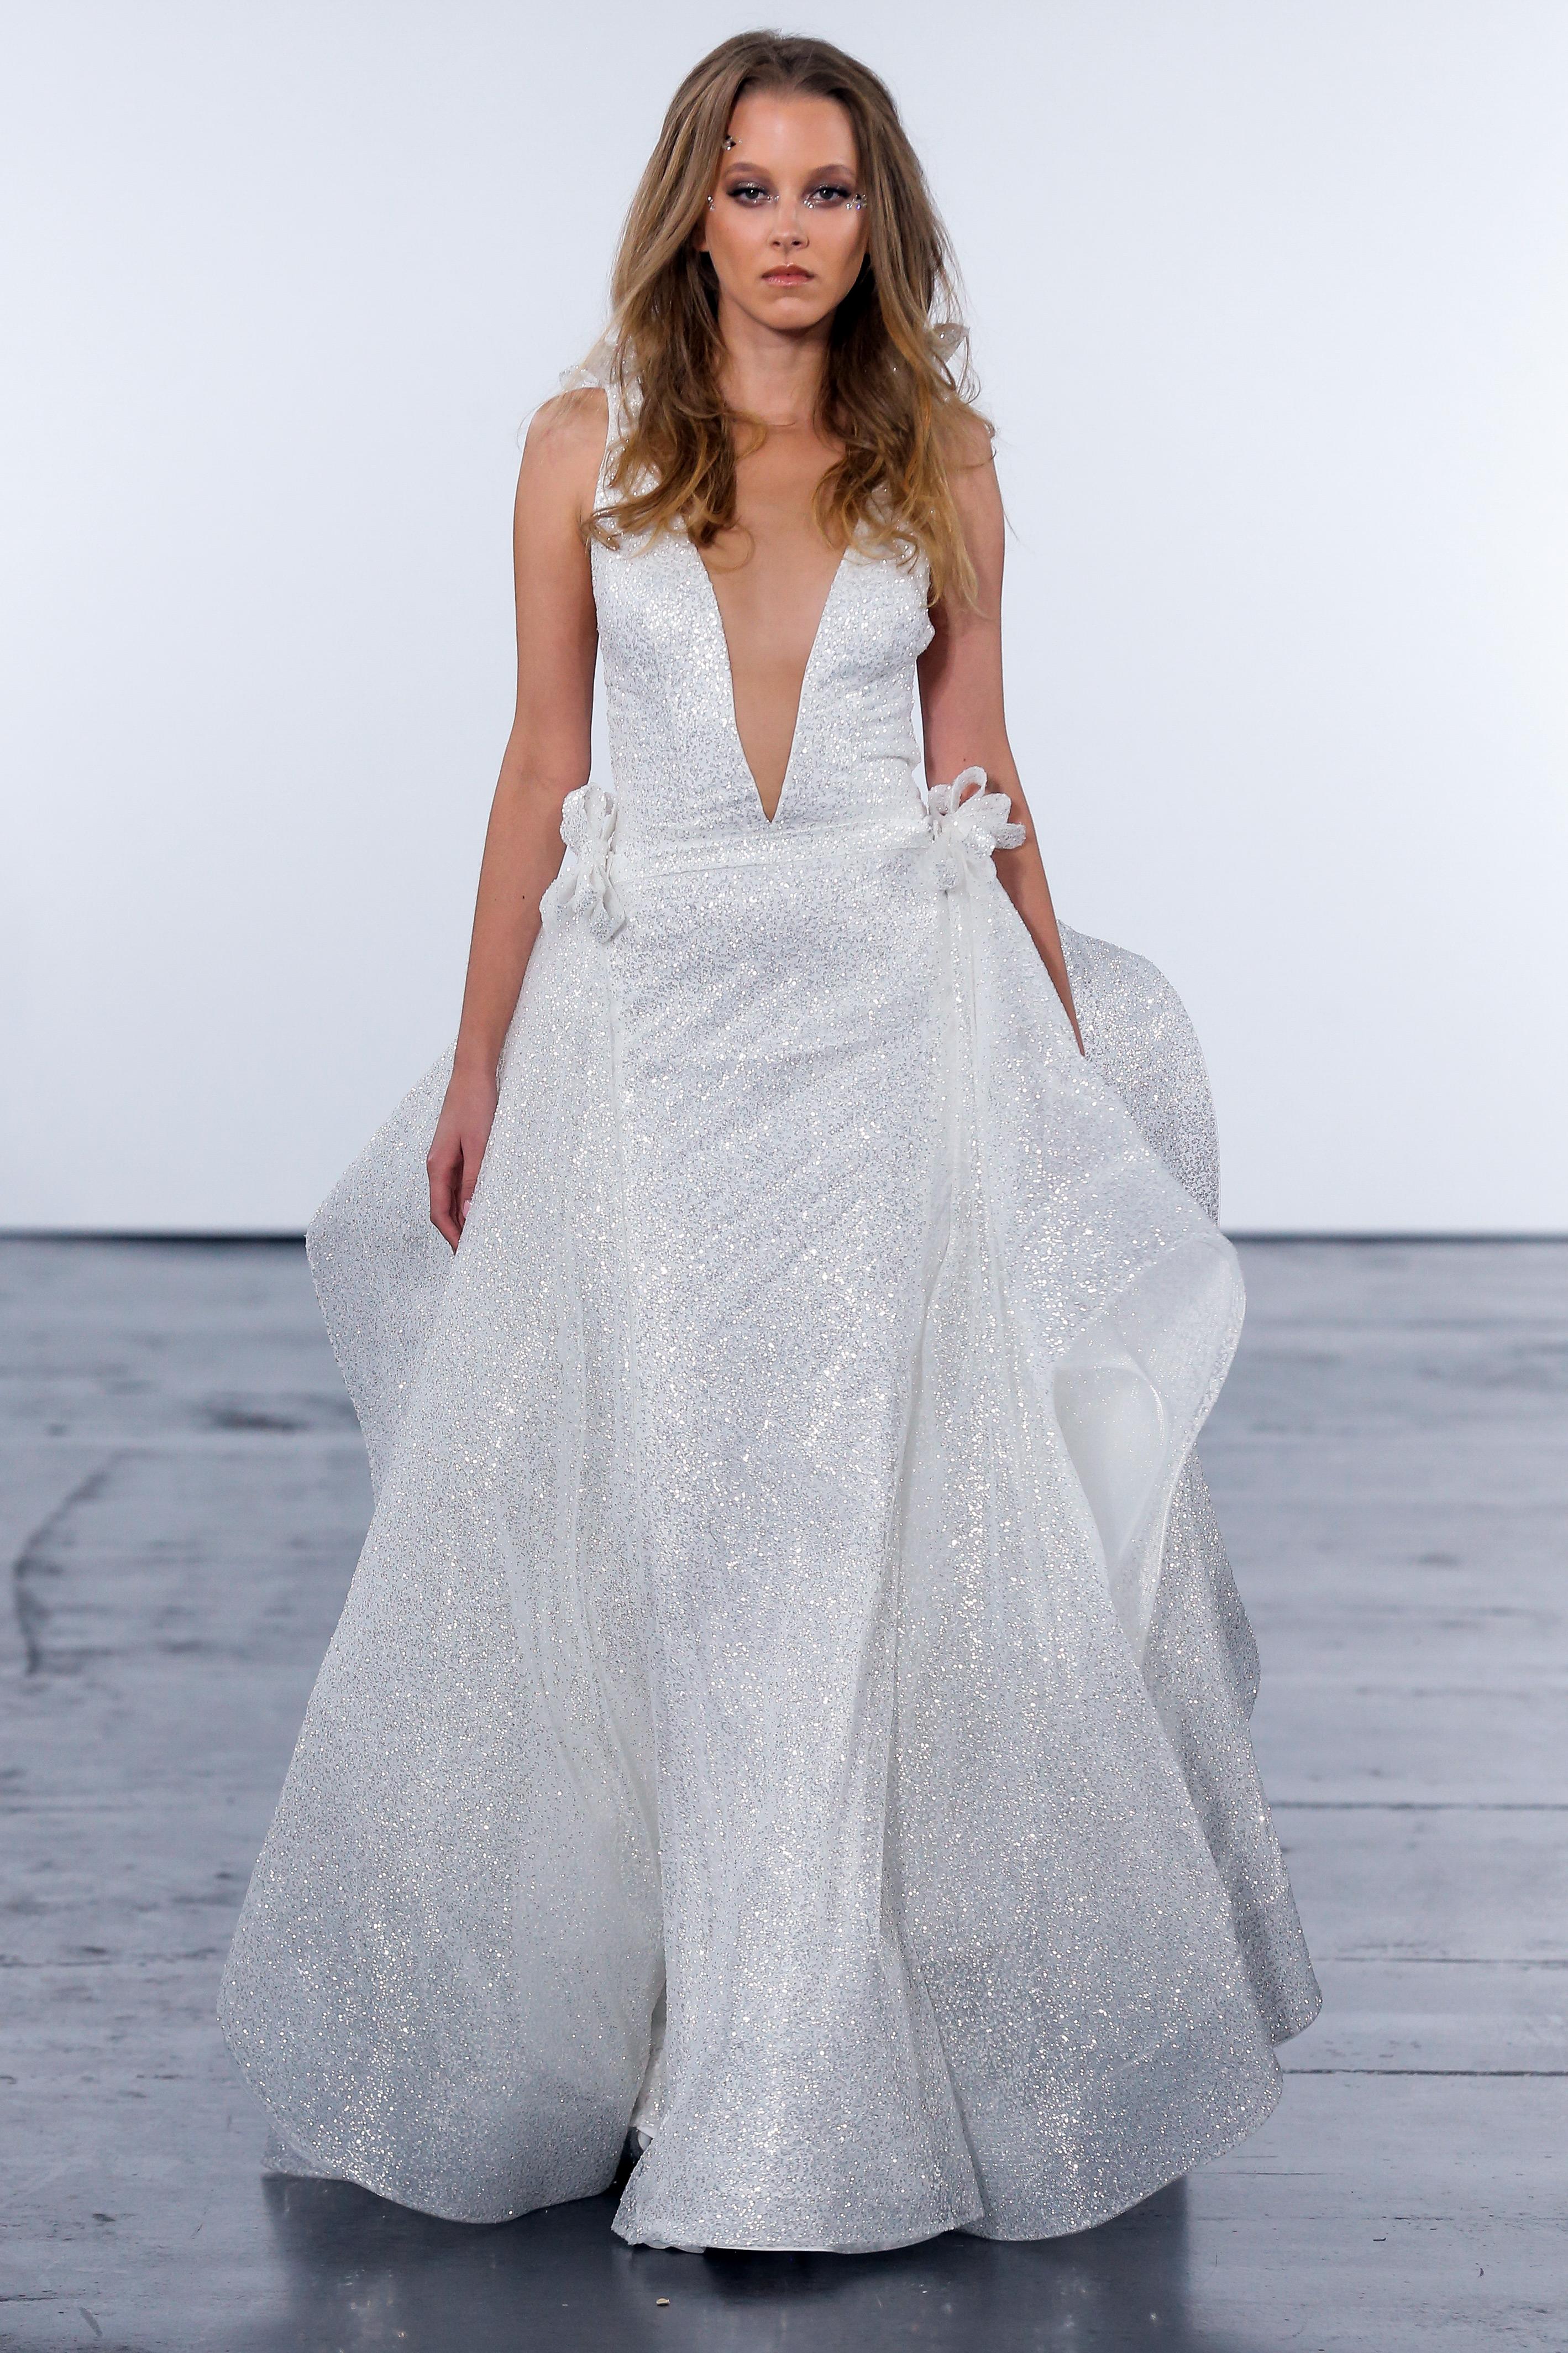 pnina tornai fall 2018 v-neck glitter wedding dress